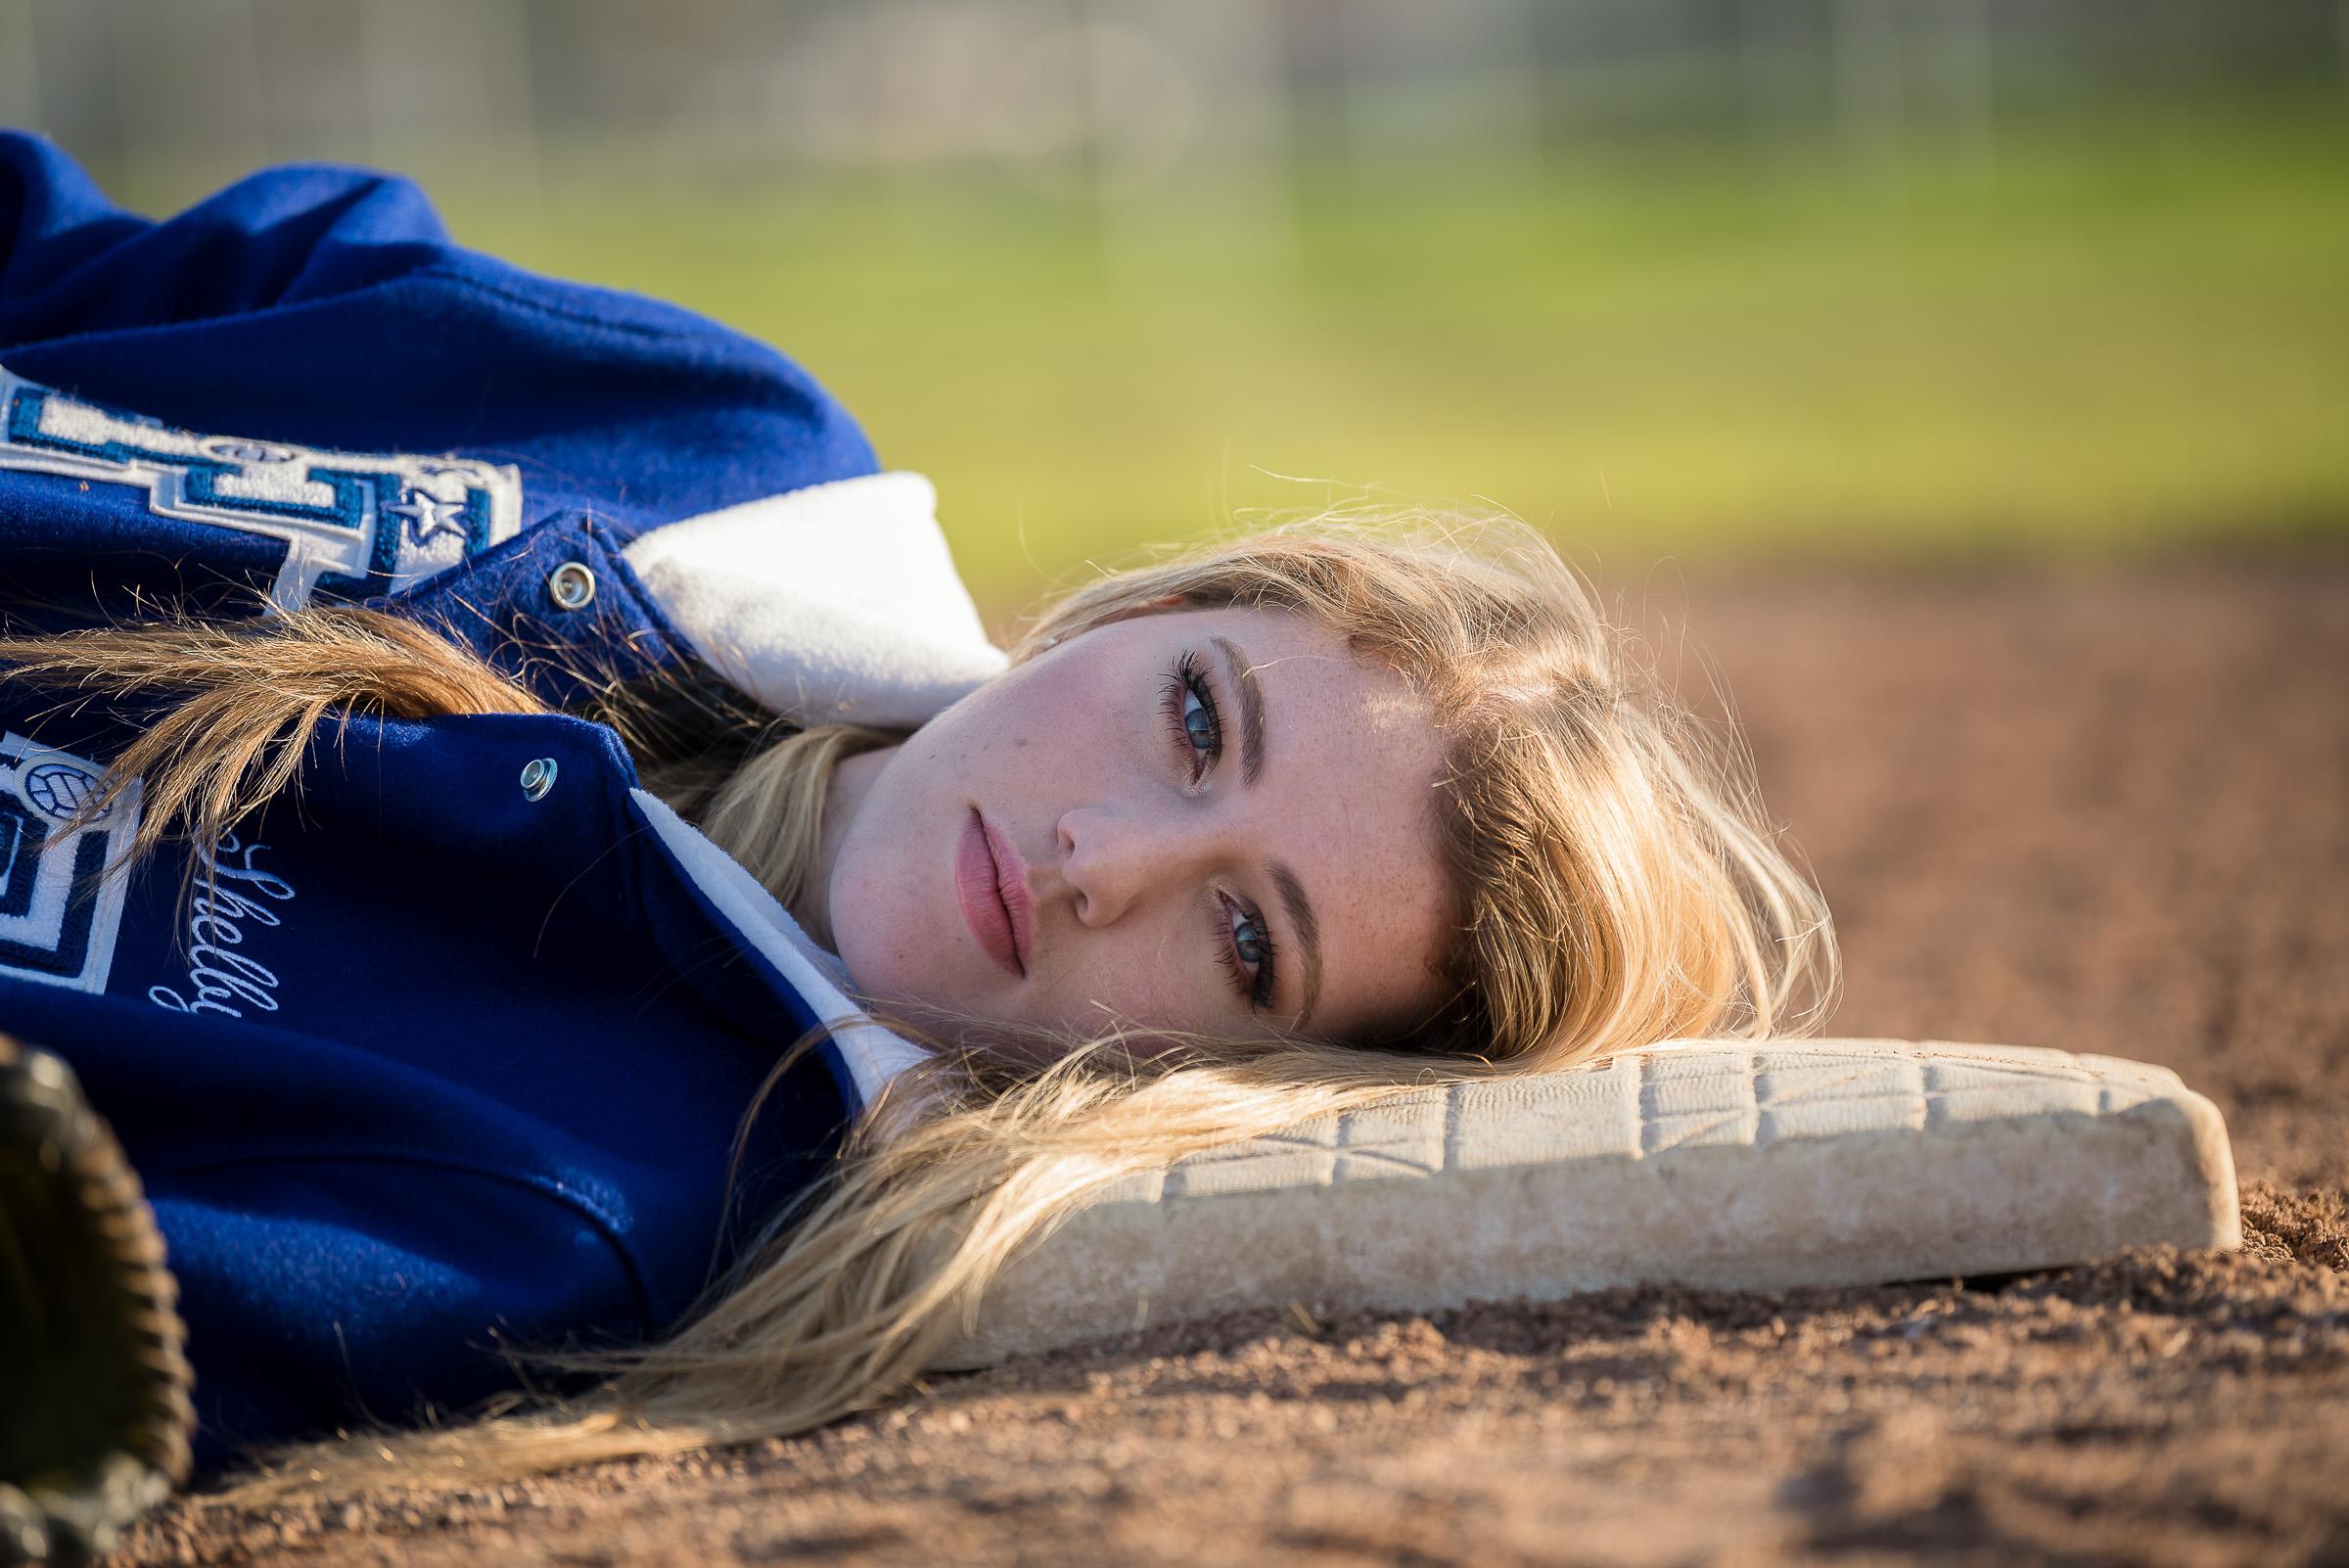 HumboldtCountySeniorPhotographer-Shelby-FortunaHigh-Softball-10.JPG